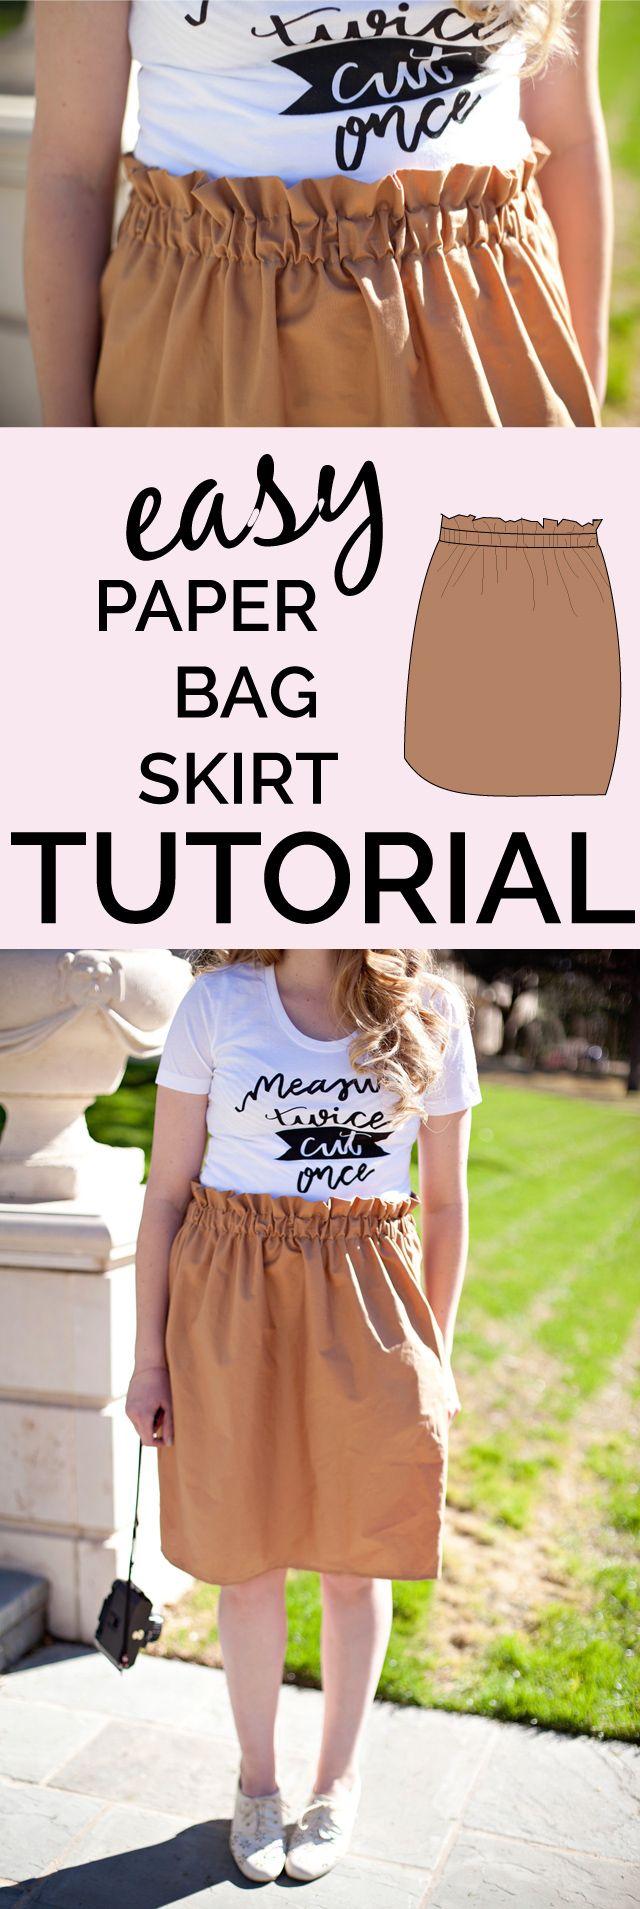 paper bag skirt tutorial | Pinterest | Mädchen rock, Nähen für ...